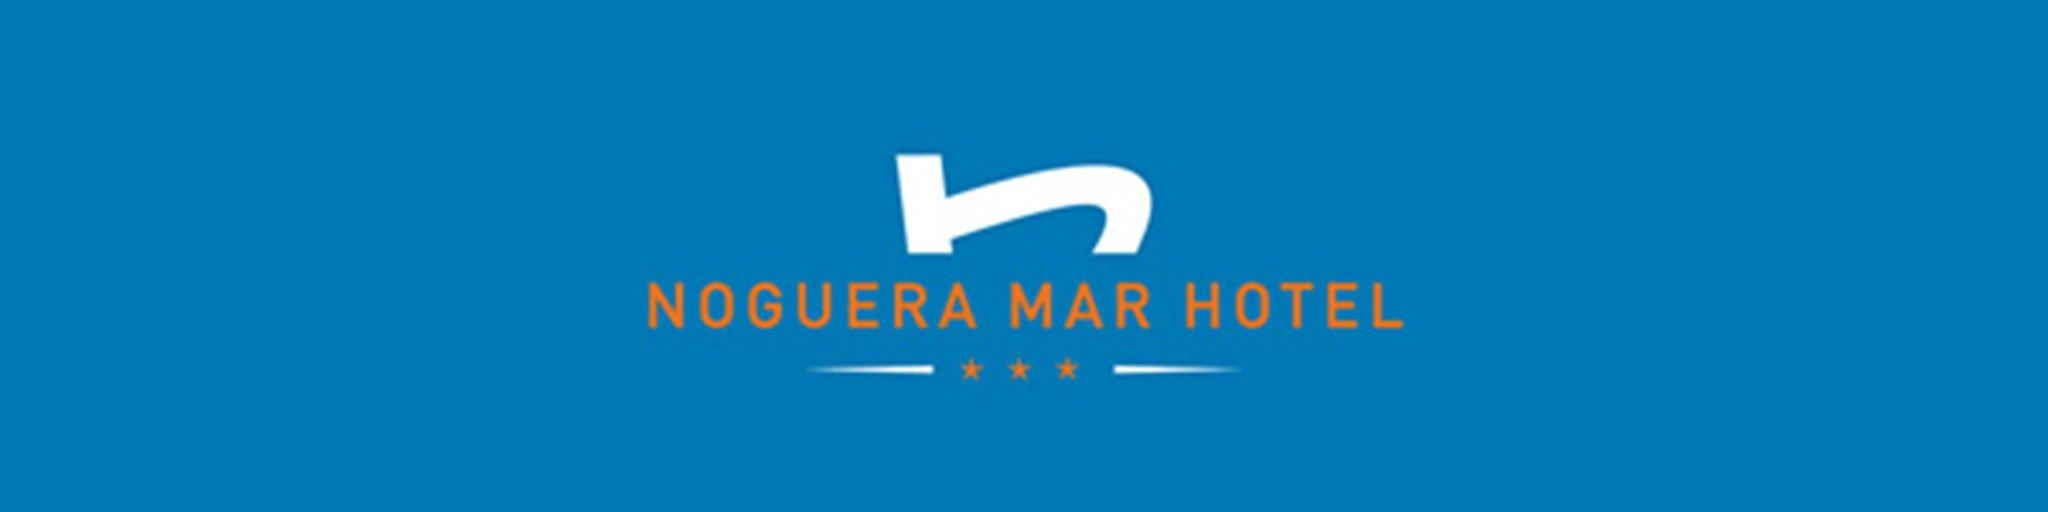 Noguera Mar Hotel's logo